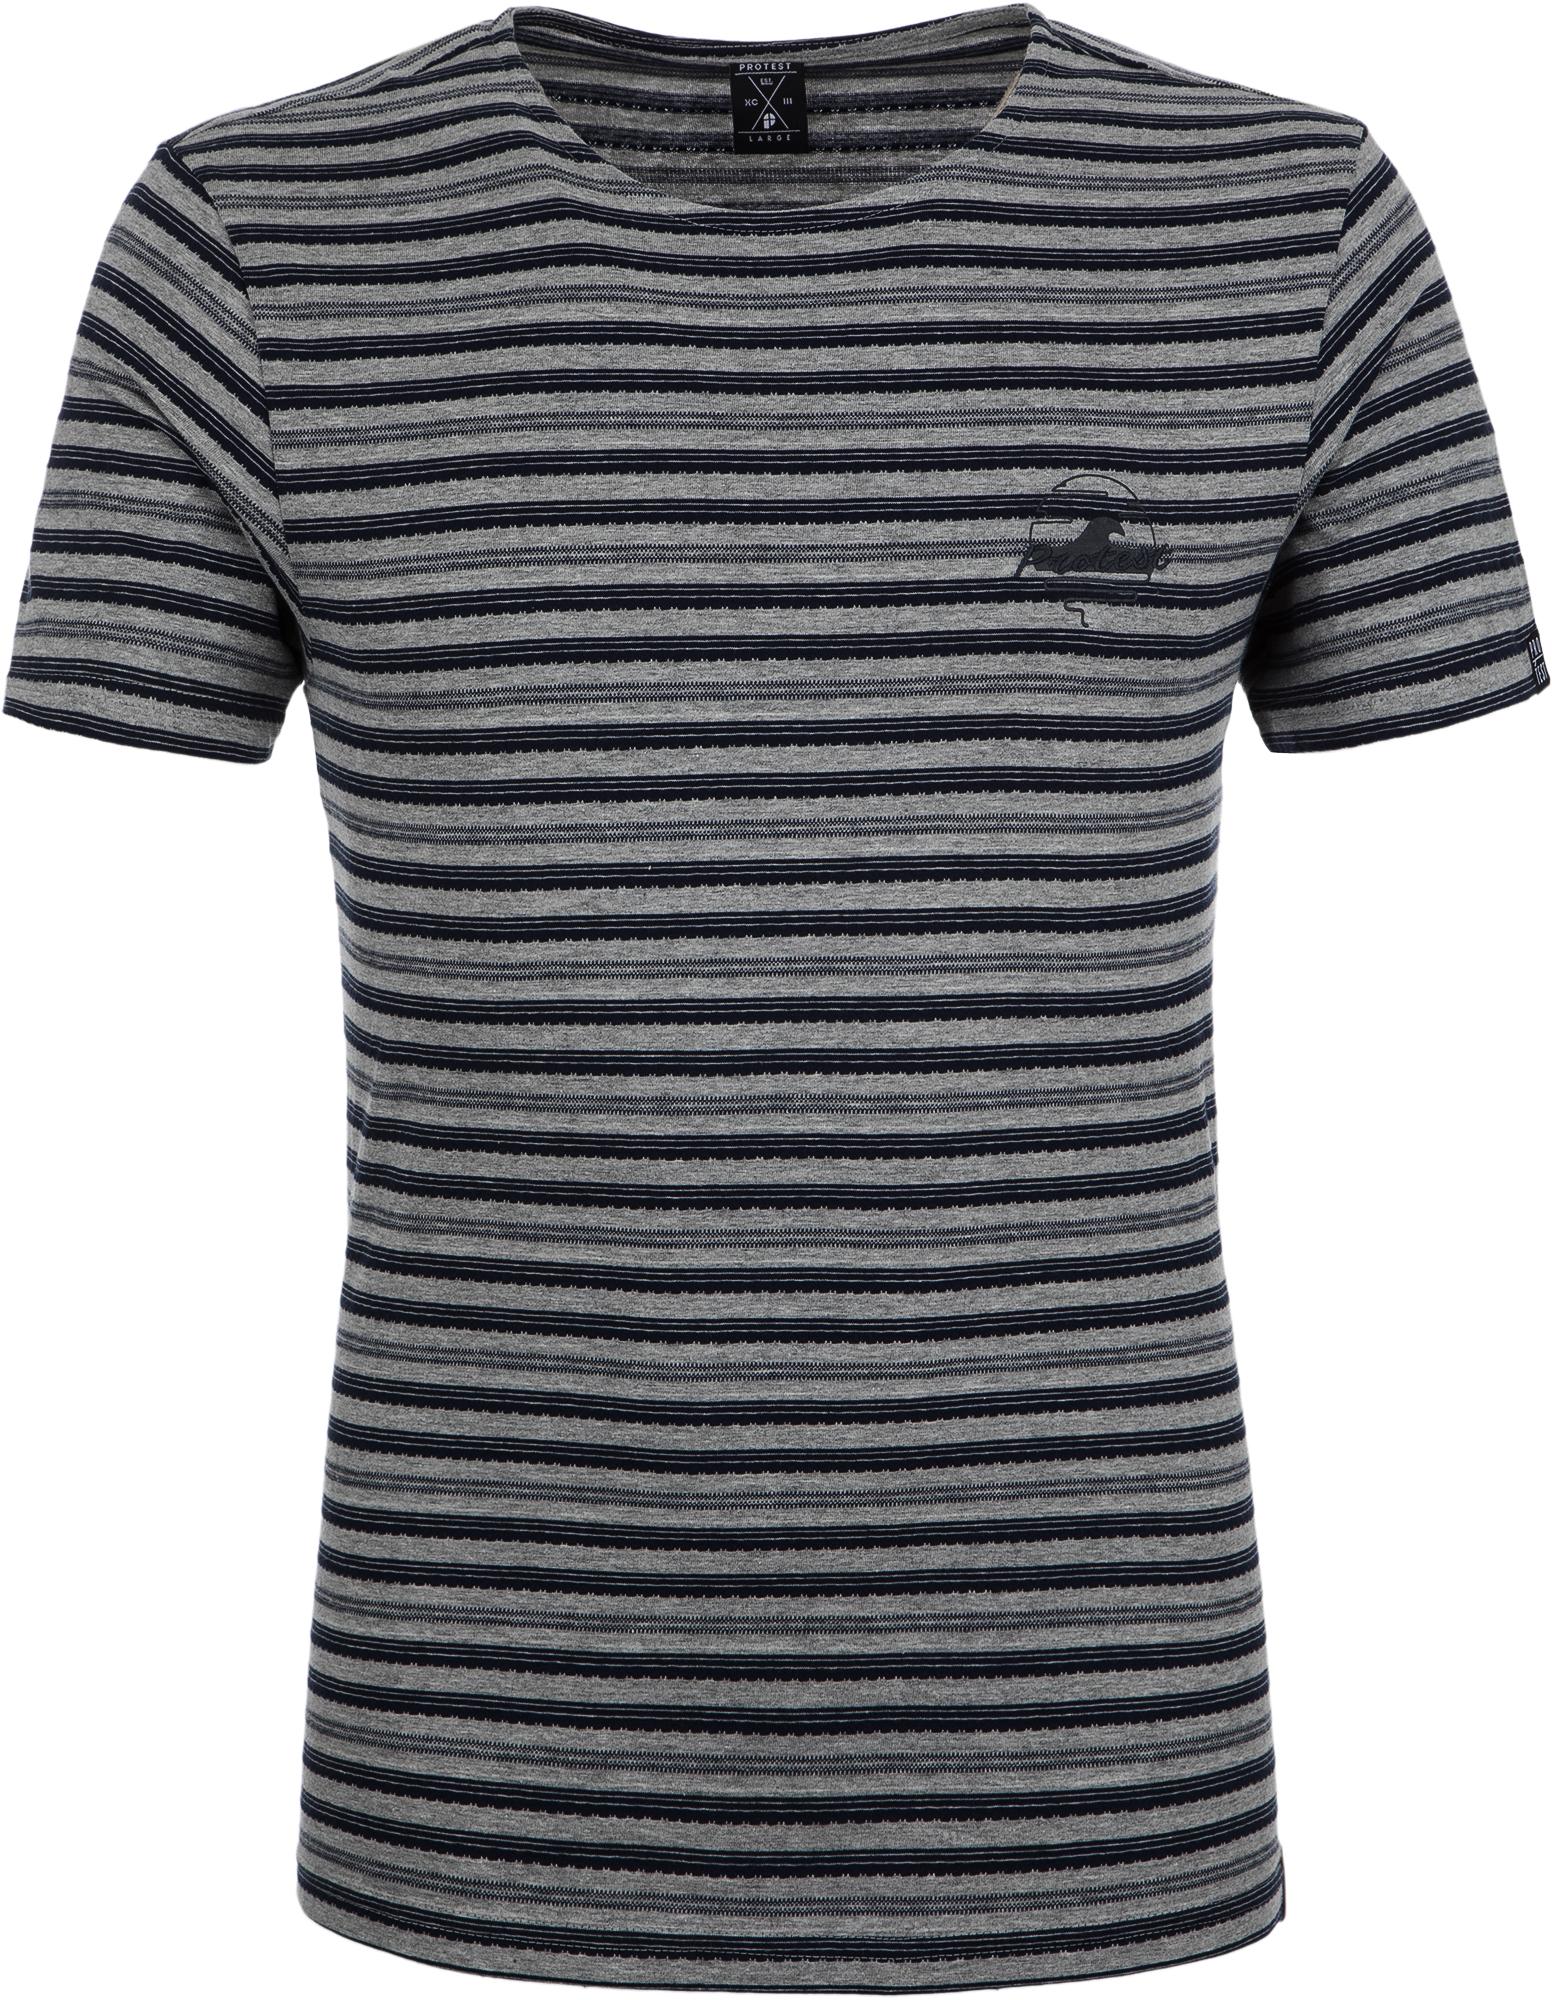 футболка мужская quiksilver цвет серый eqyzt04286 ktah размер l 50 52 Protest Футболка мужская Protest Belper, размер 50-52